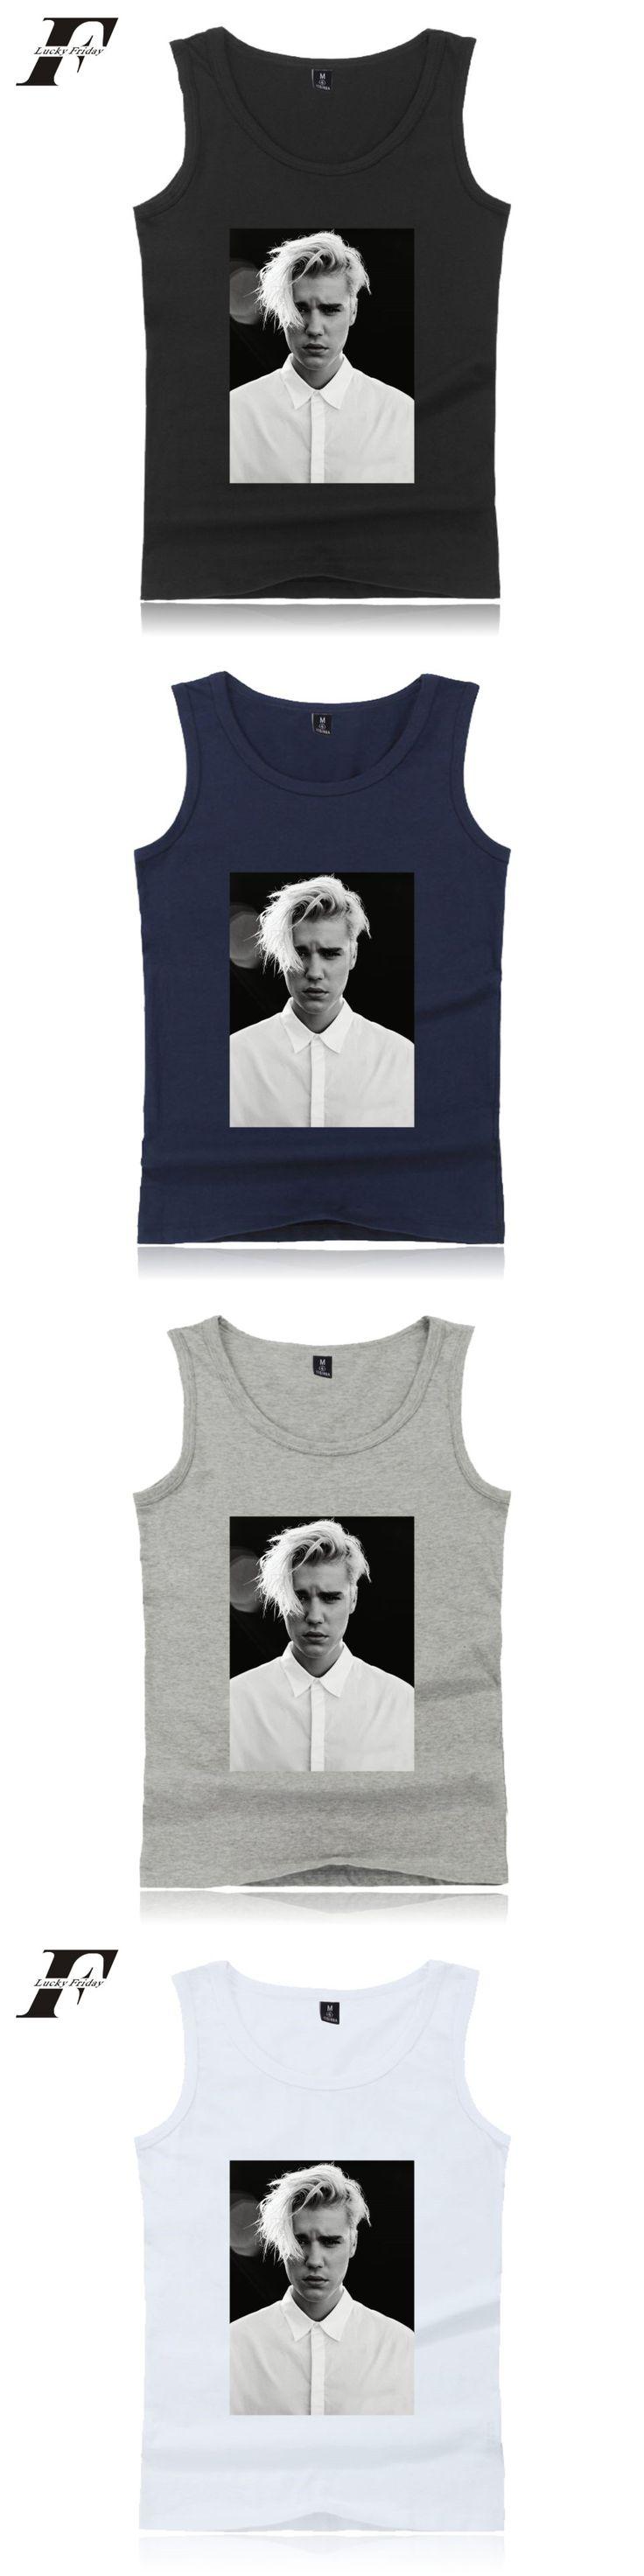 2017 New Justin bieber Print Vest Men's / Women's Fitness Tank Top Healthy Kpop Shirt Dress Summer Cotton Vest size XXS-4XL